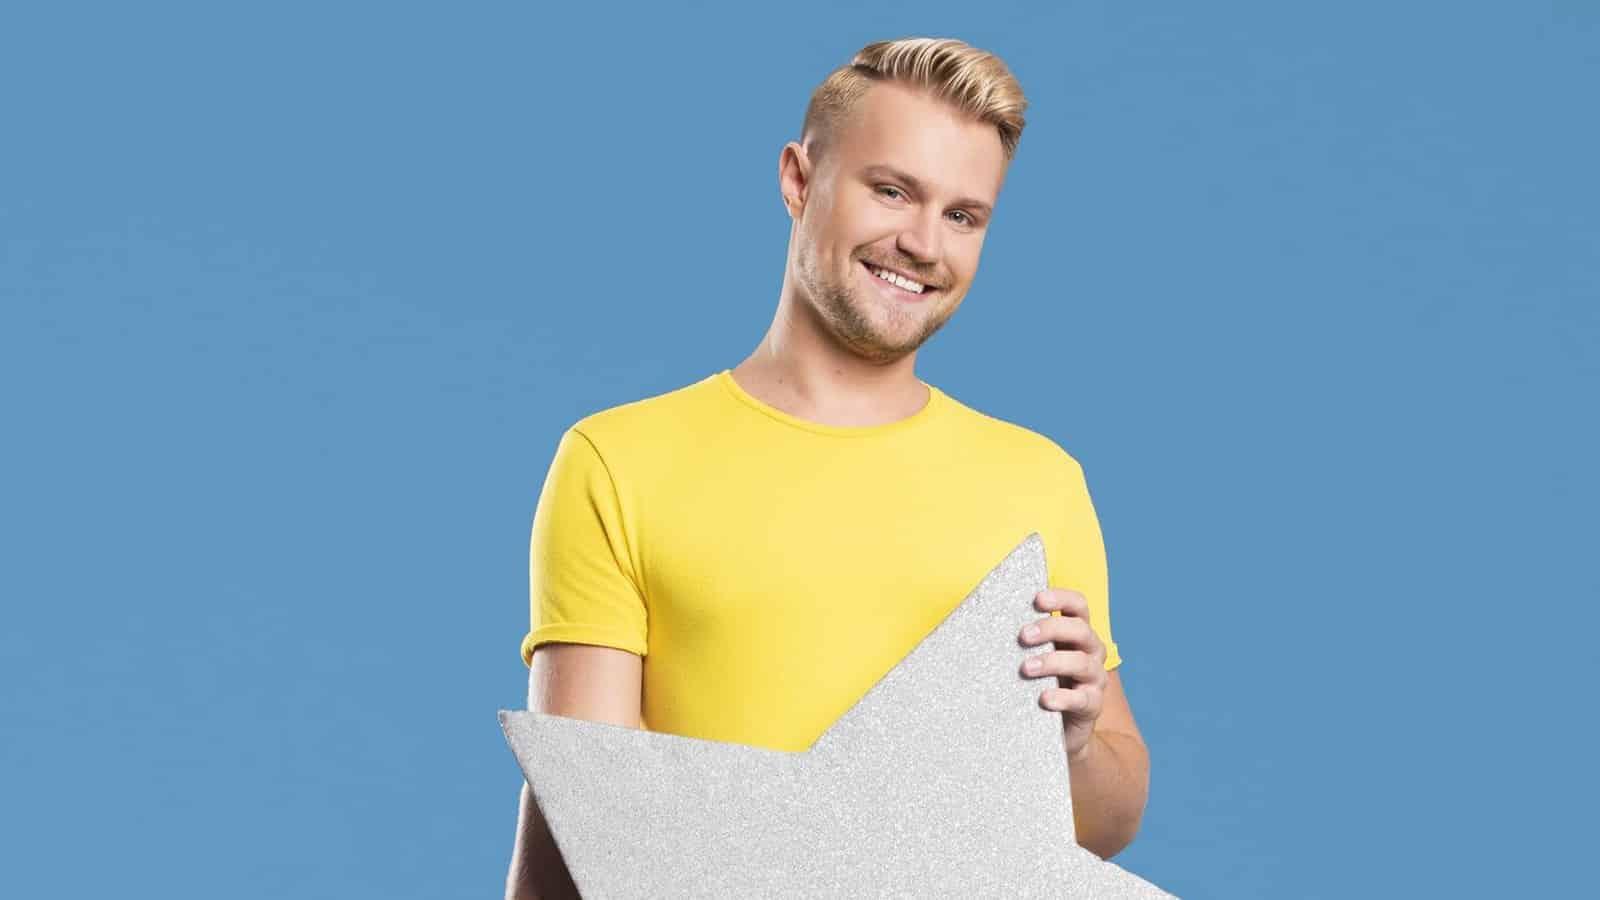 Aaron Königs zieht bei Promi Big Brother ein